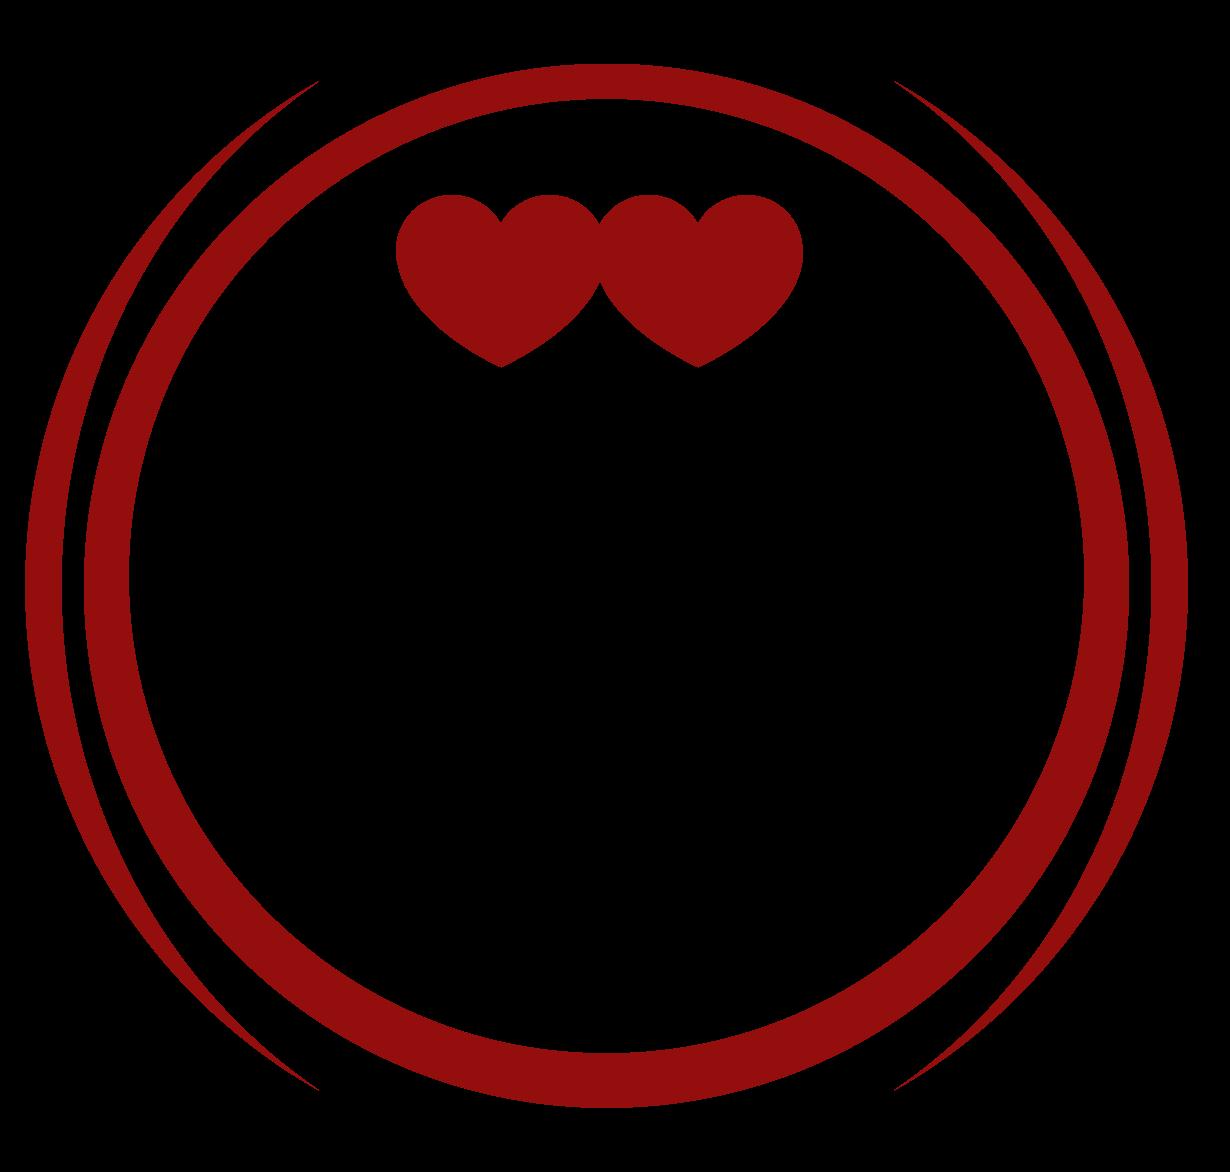 Alex-Logotipos-PDF-4-2-e1610114658946